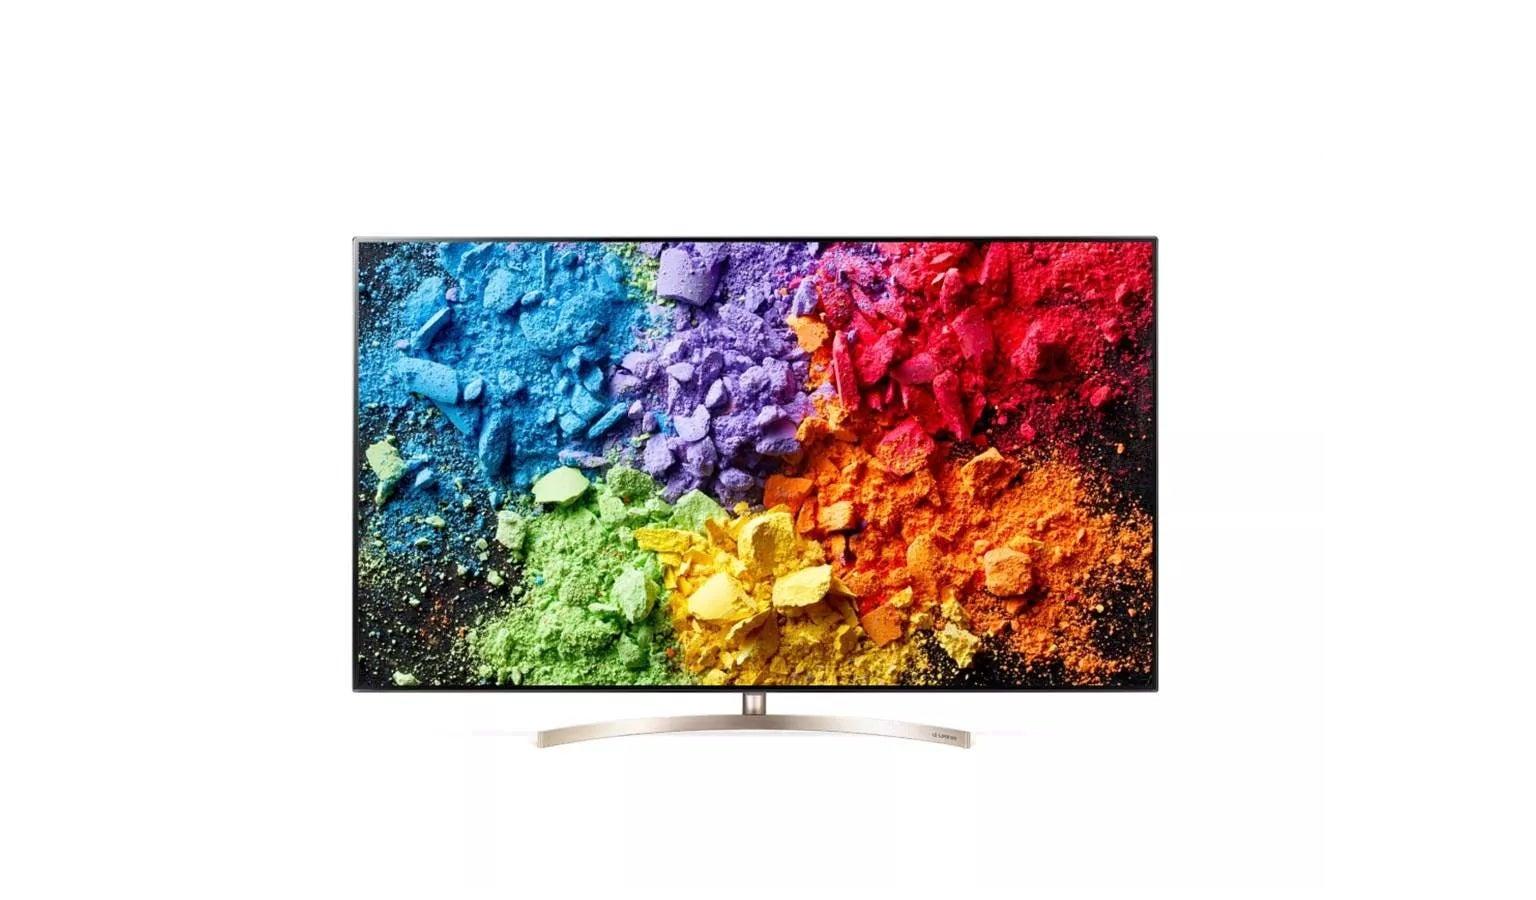 LG 65SK9500 65inch UHD LED LCD TV